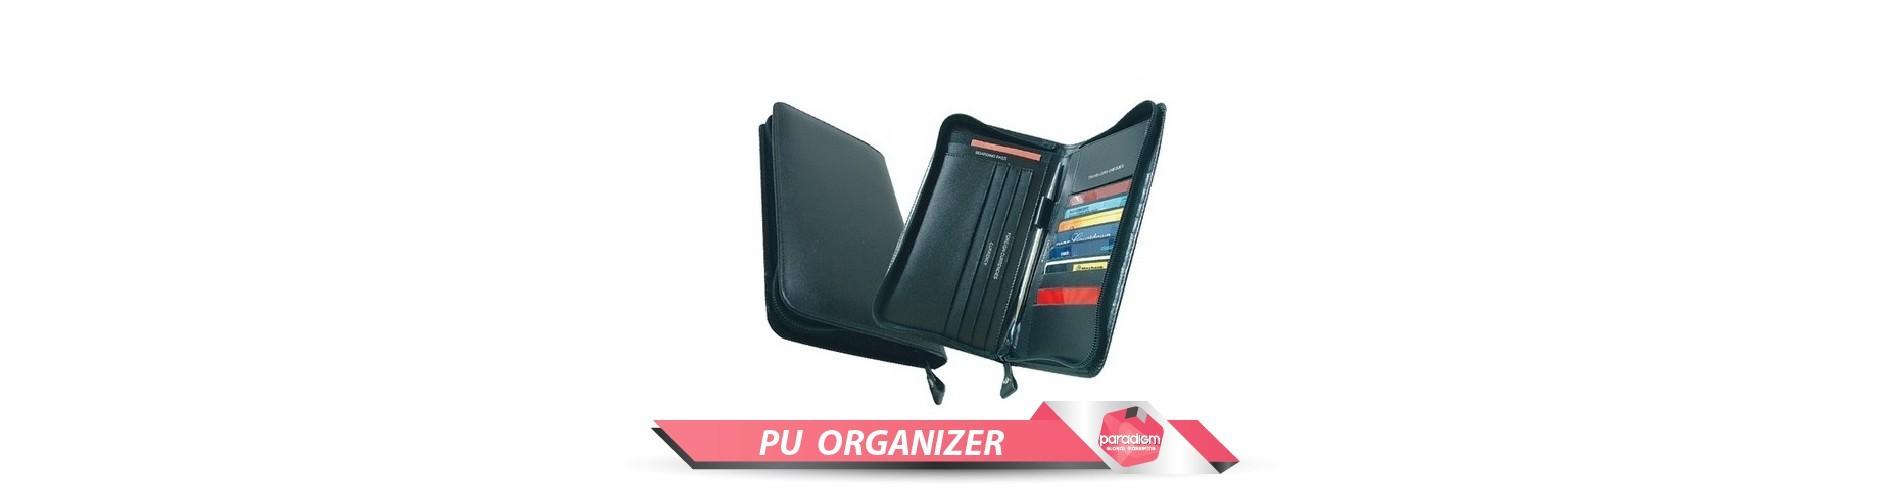 PU organizer